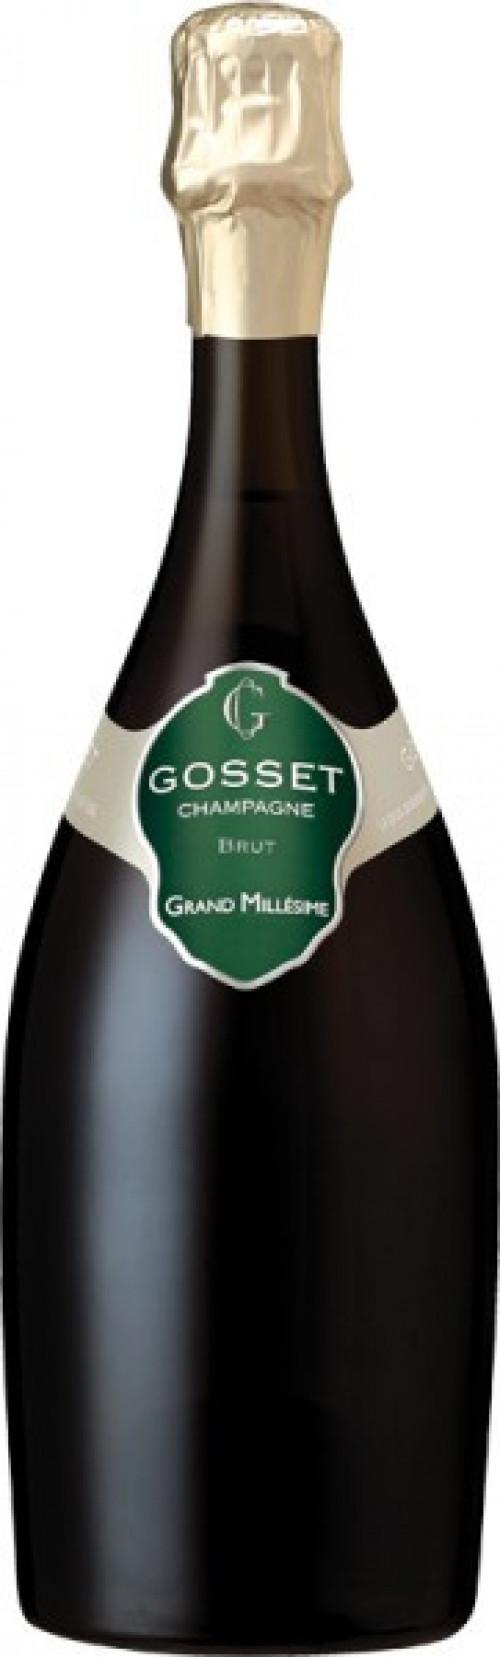 Gosset Brut Champagne Grand Millesime 2006